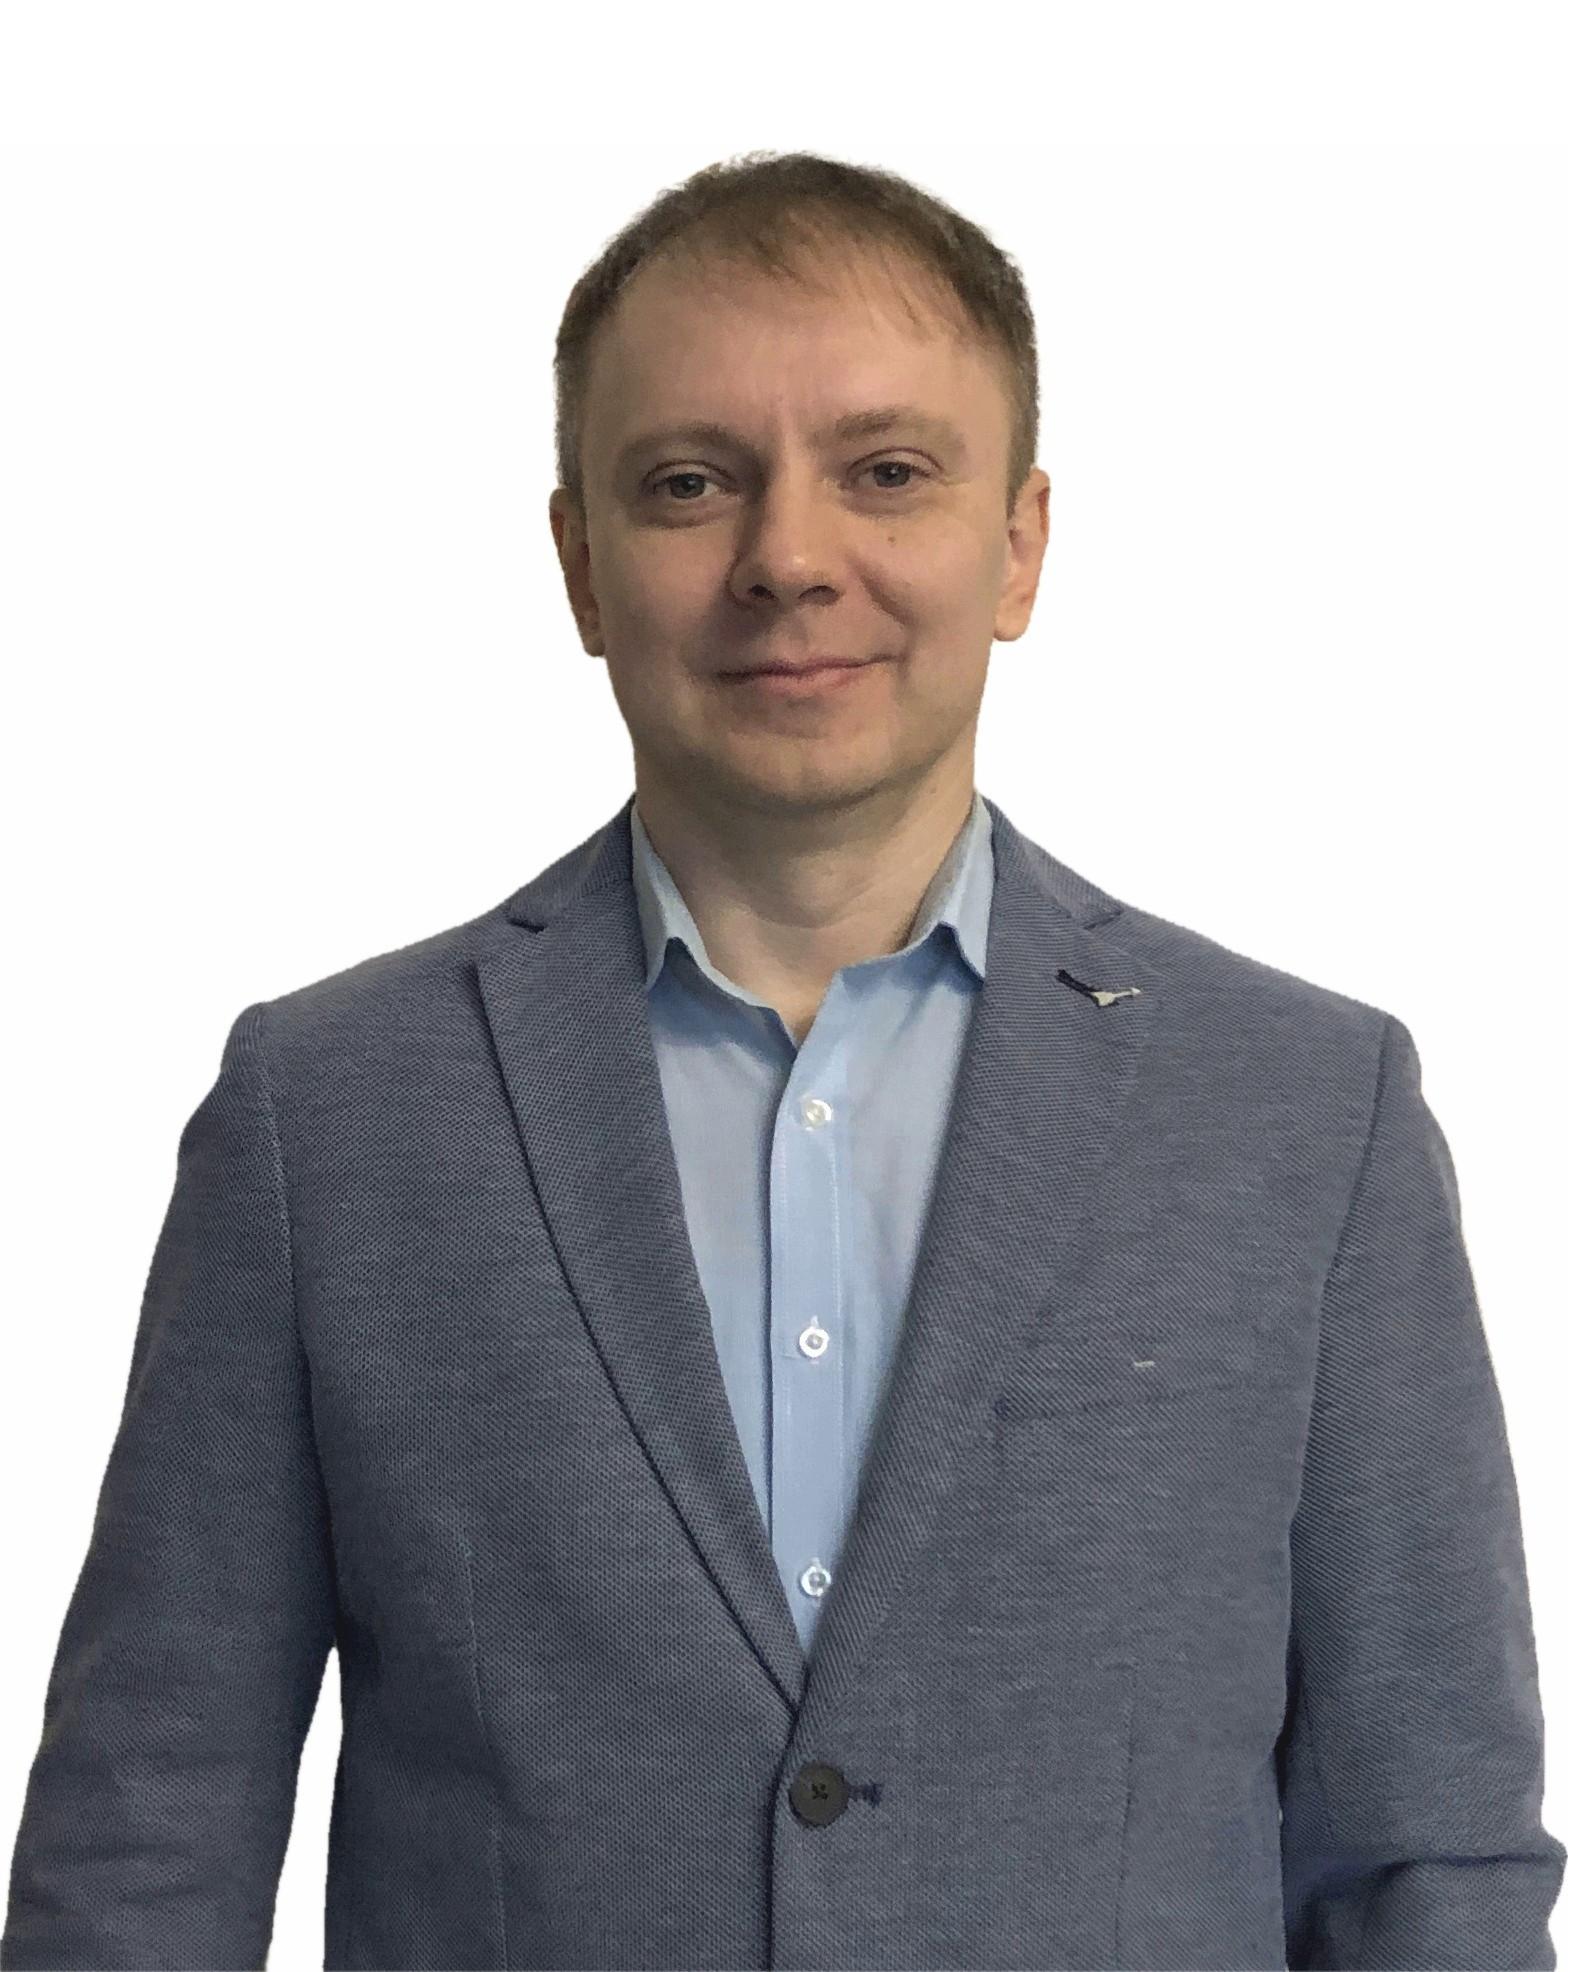 Адвокат Роман Панько